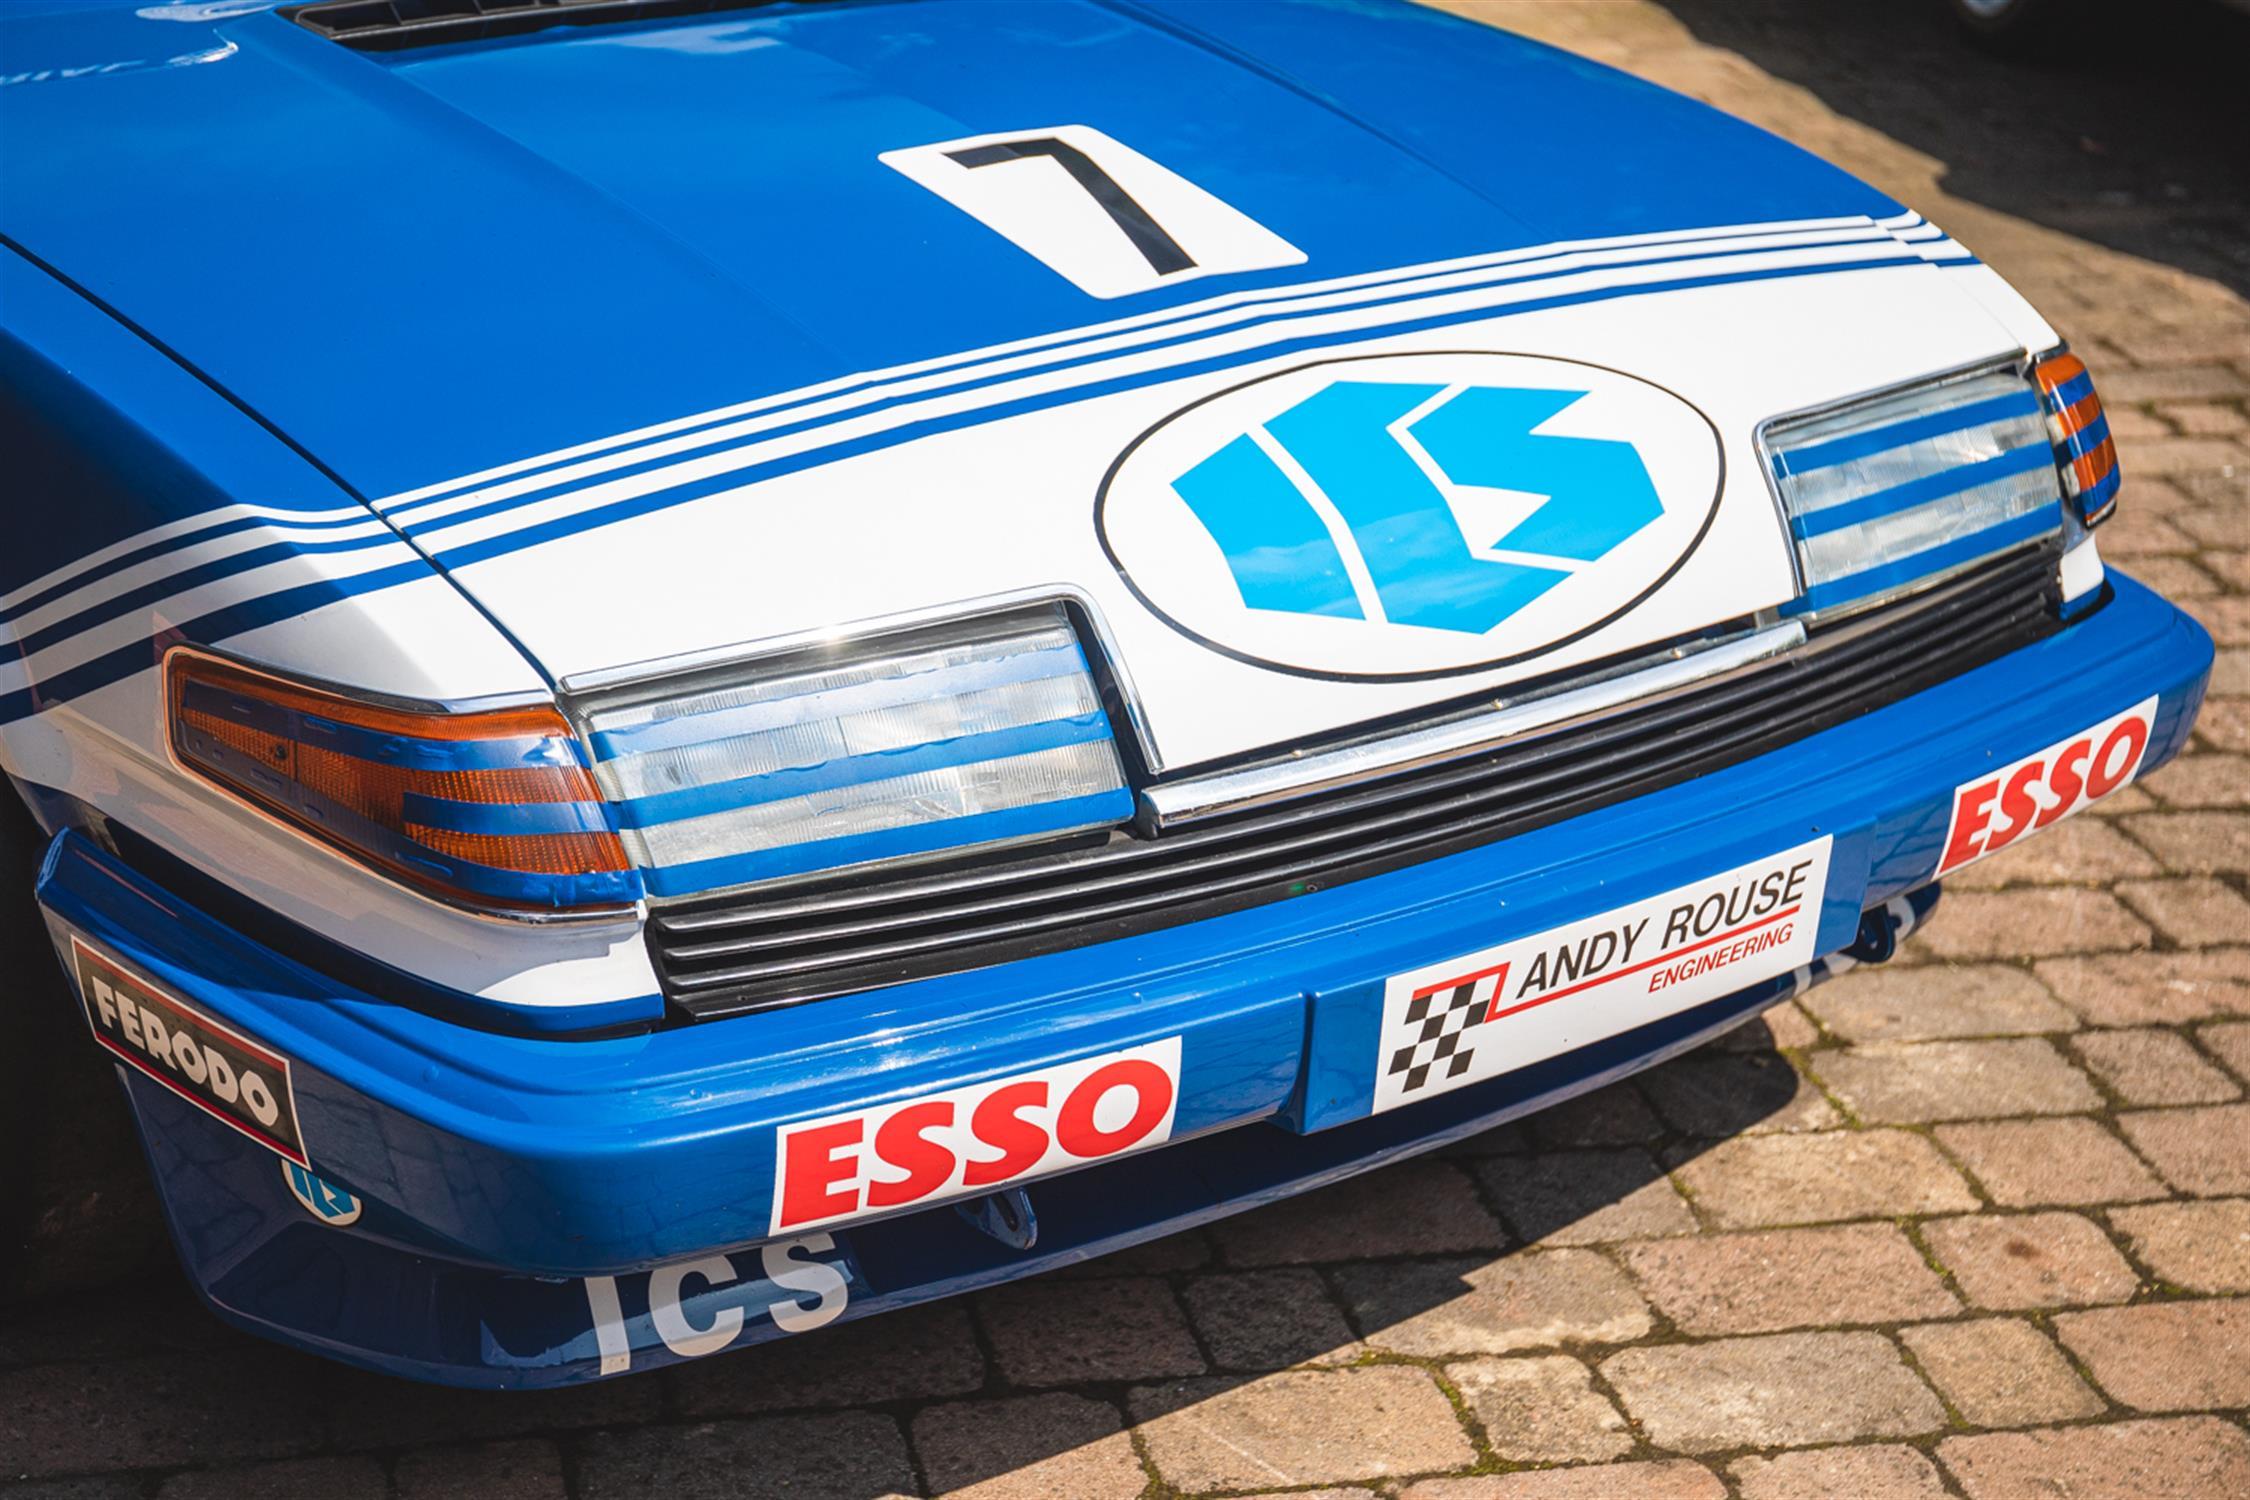 BTCC Championship-Winning 'Group A' ICS Rover Vitesse - Ex-Andy Rouse - Image 11 of 12